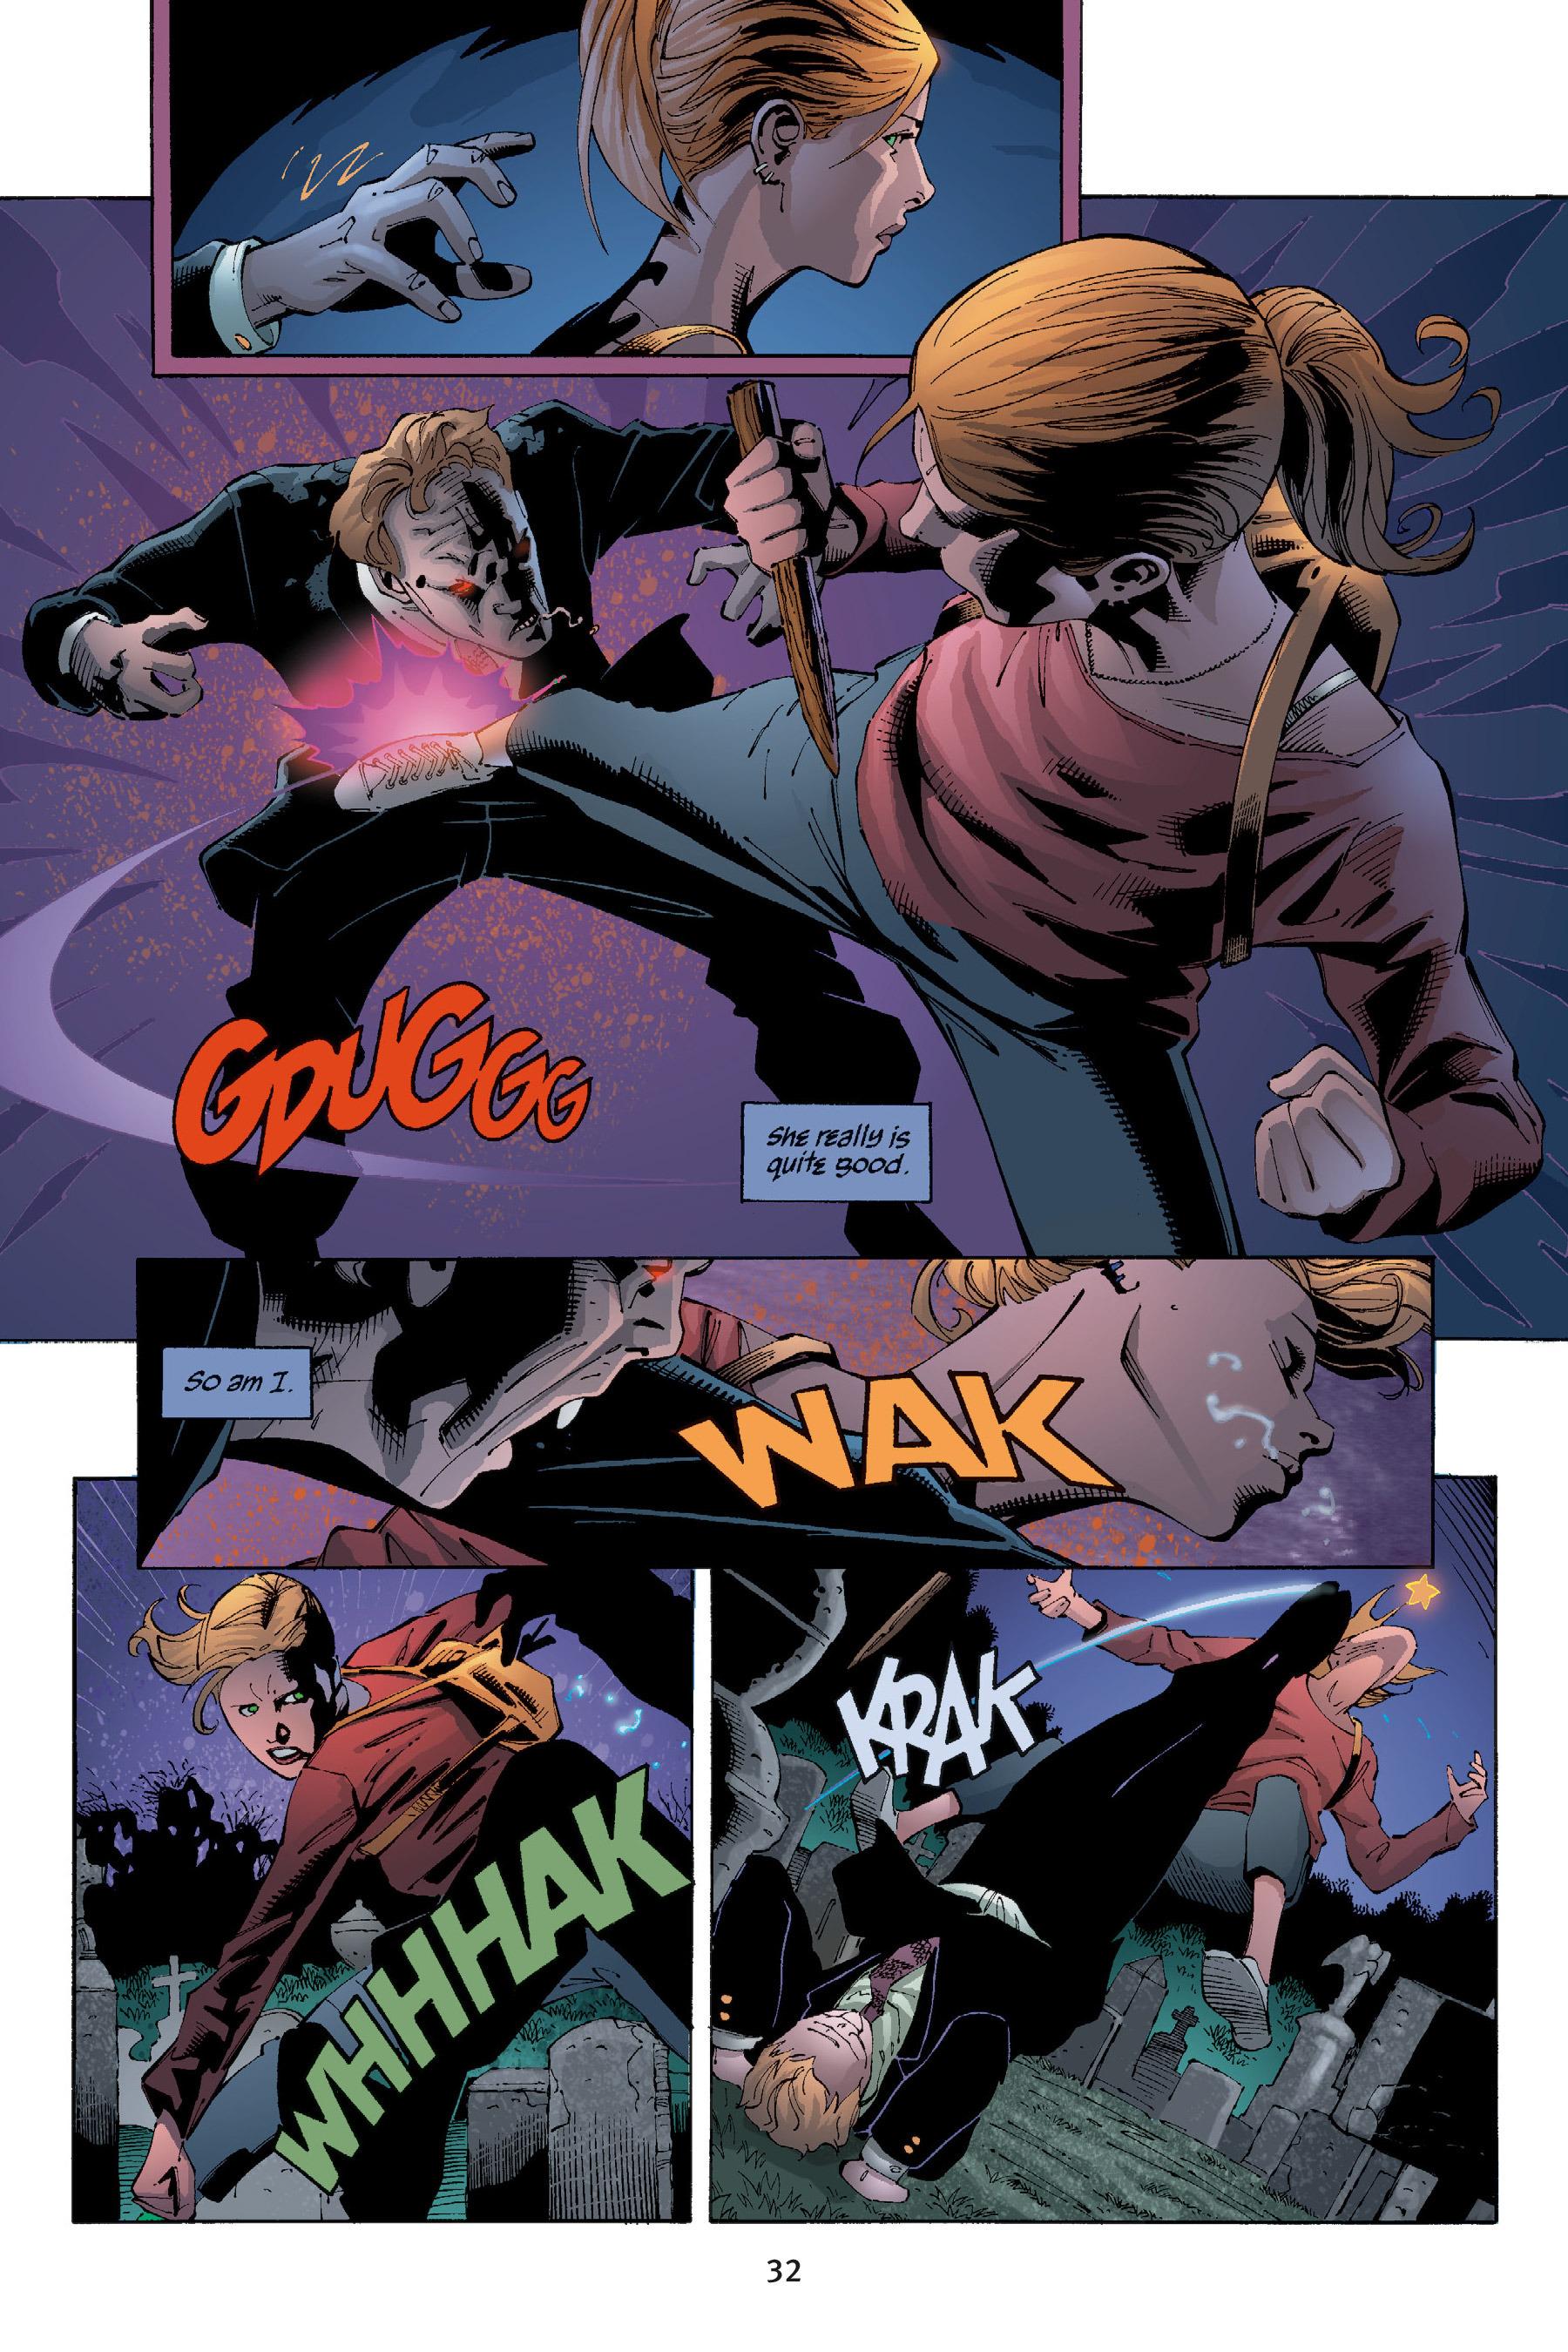 Read online Buffy the Vampire Slayer: Omnibus comic -  Issue # TPB 5 - 33